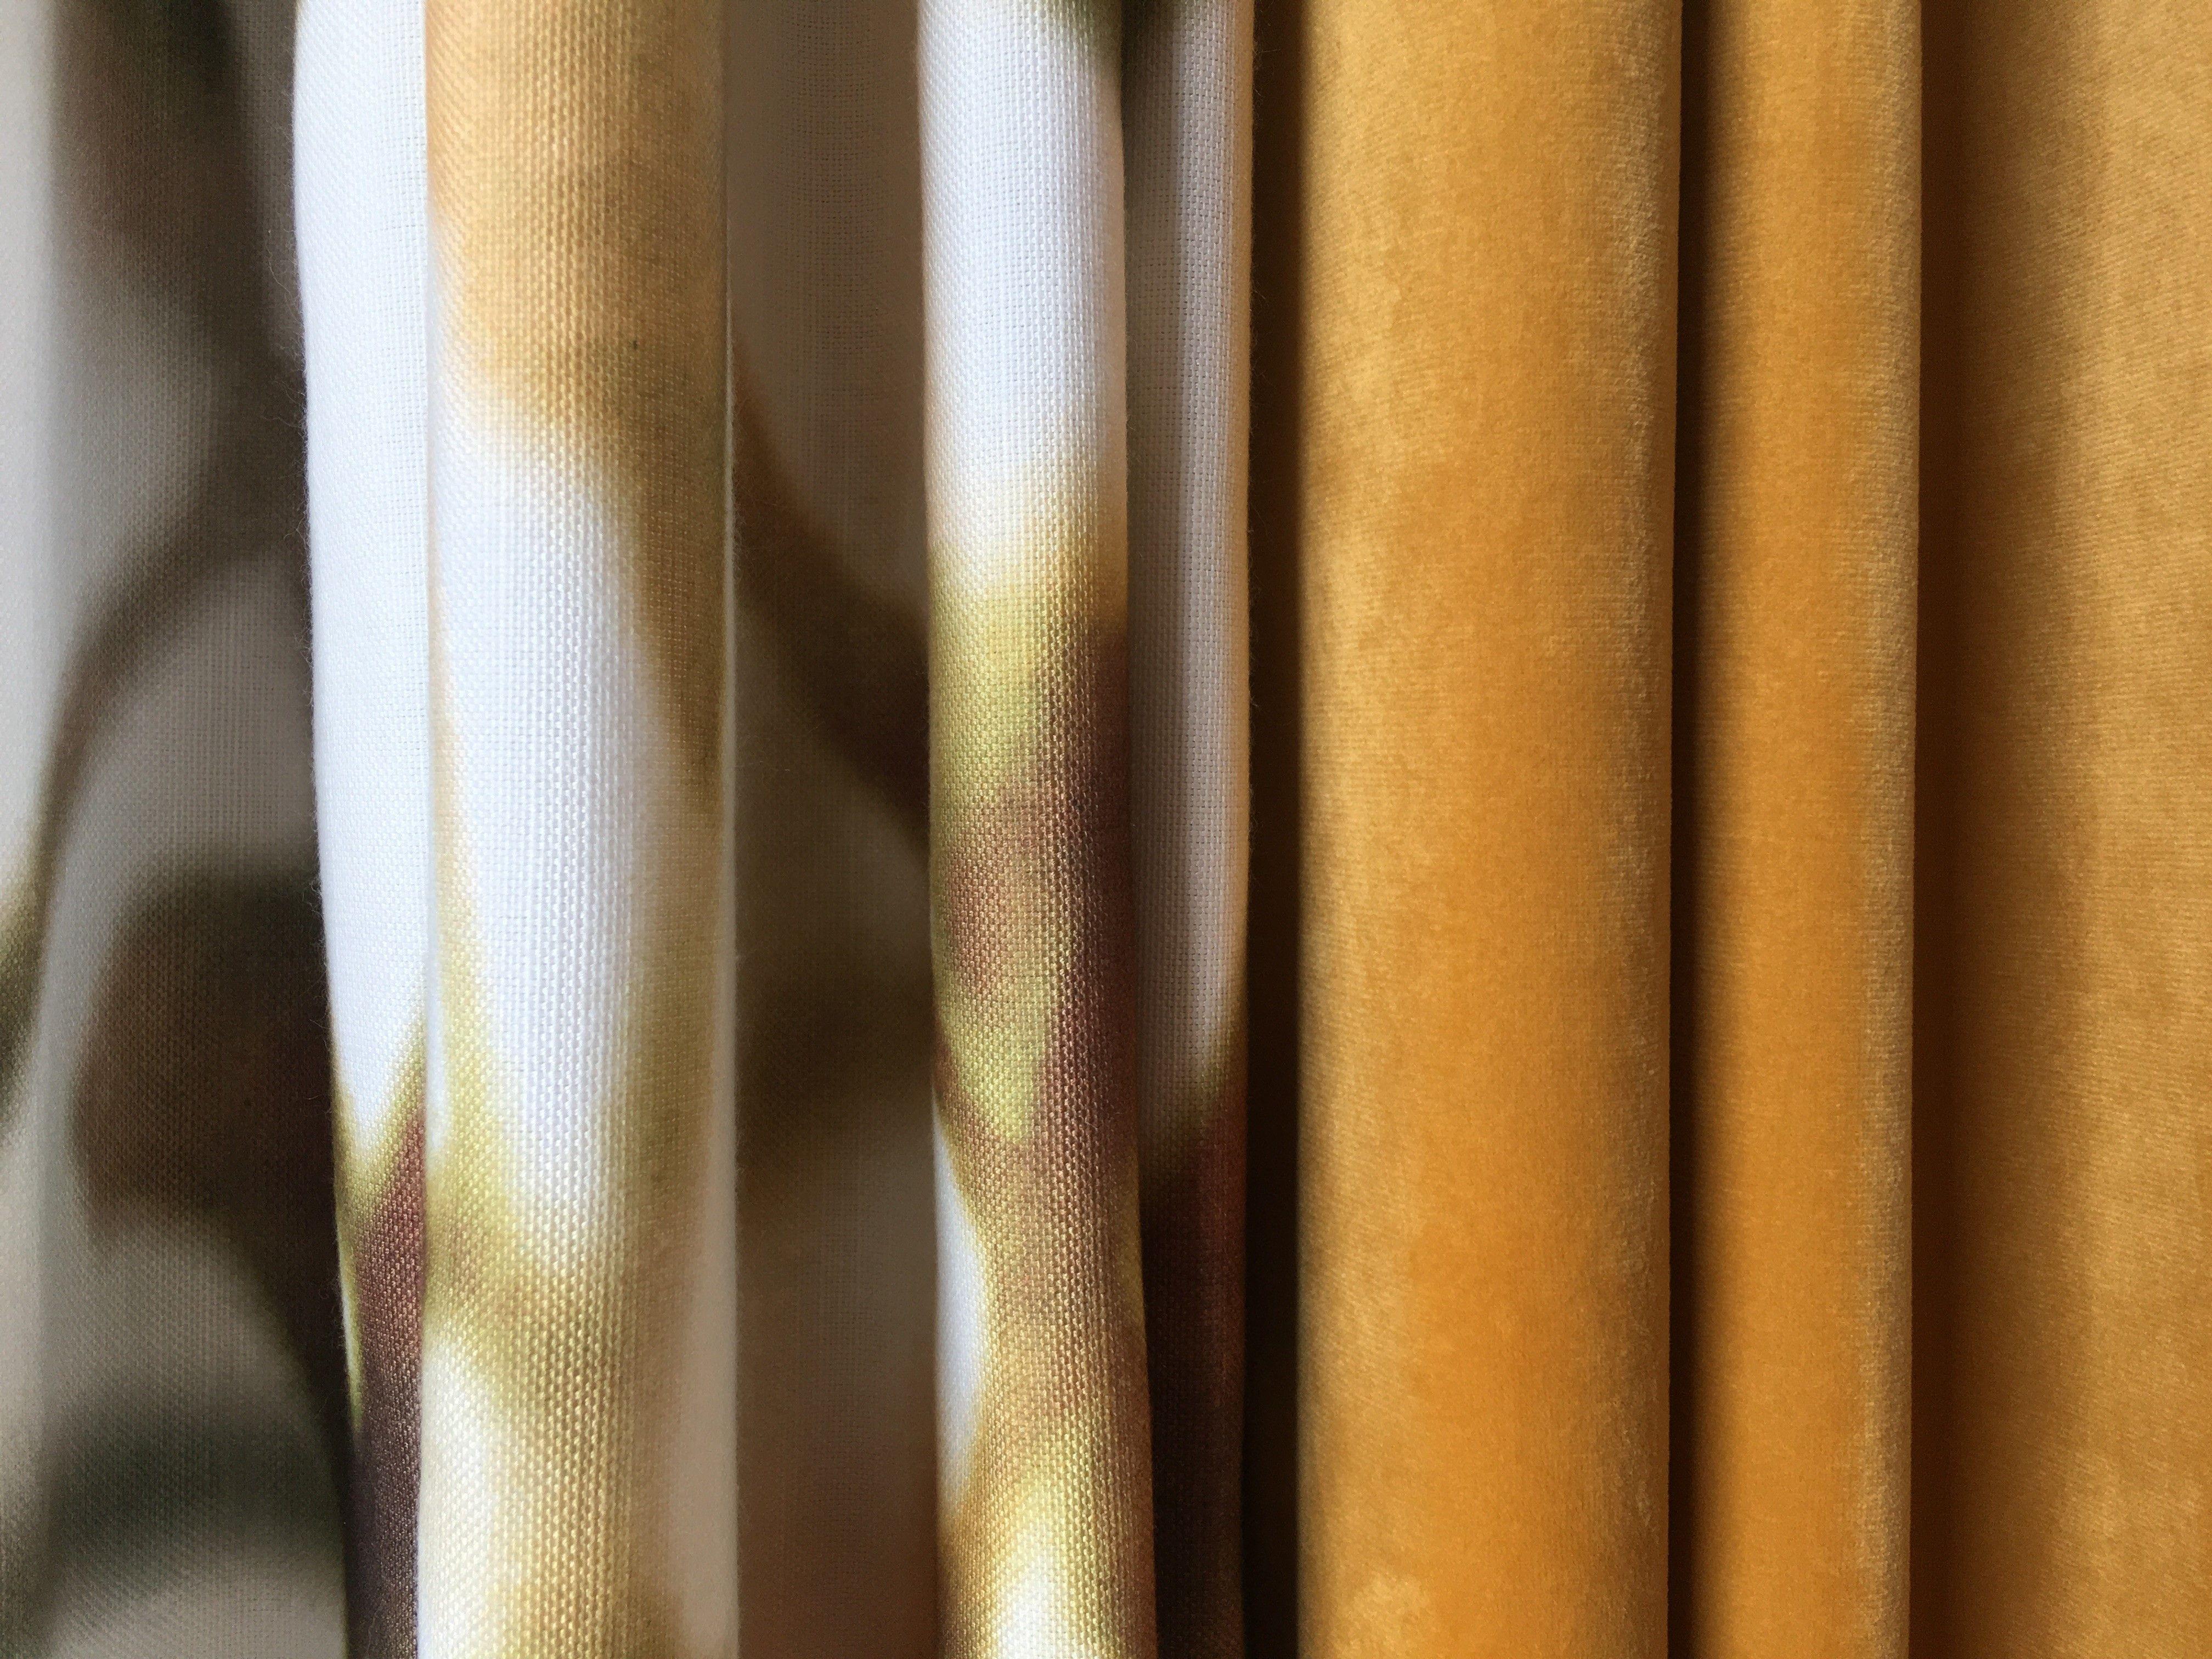 Gordijn toppoint evergreen kleur en isola kleur gordijnen